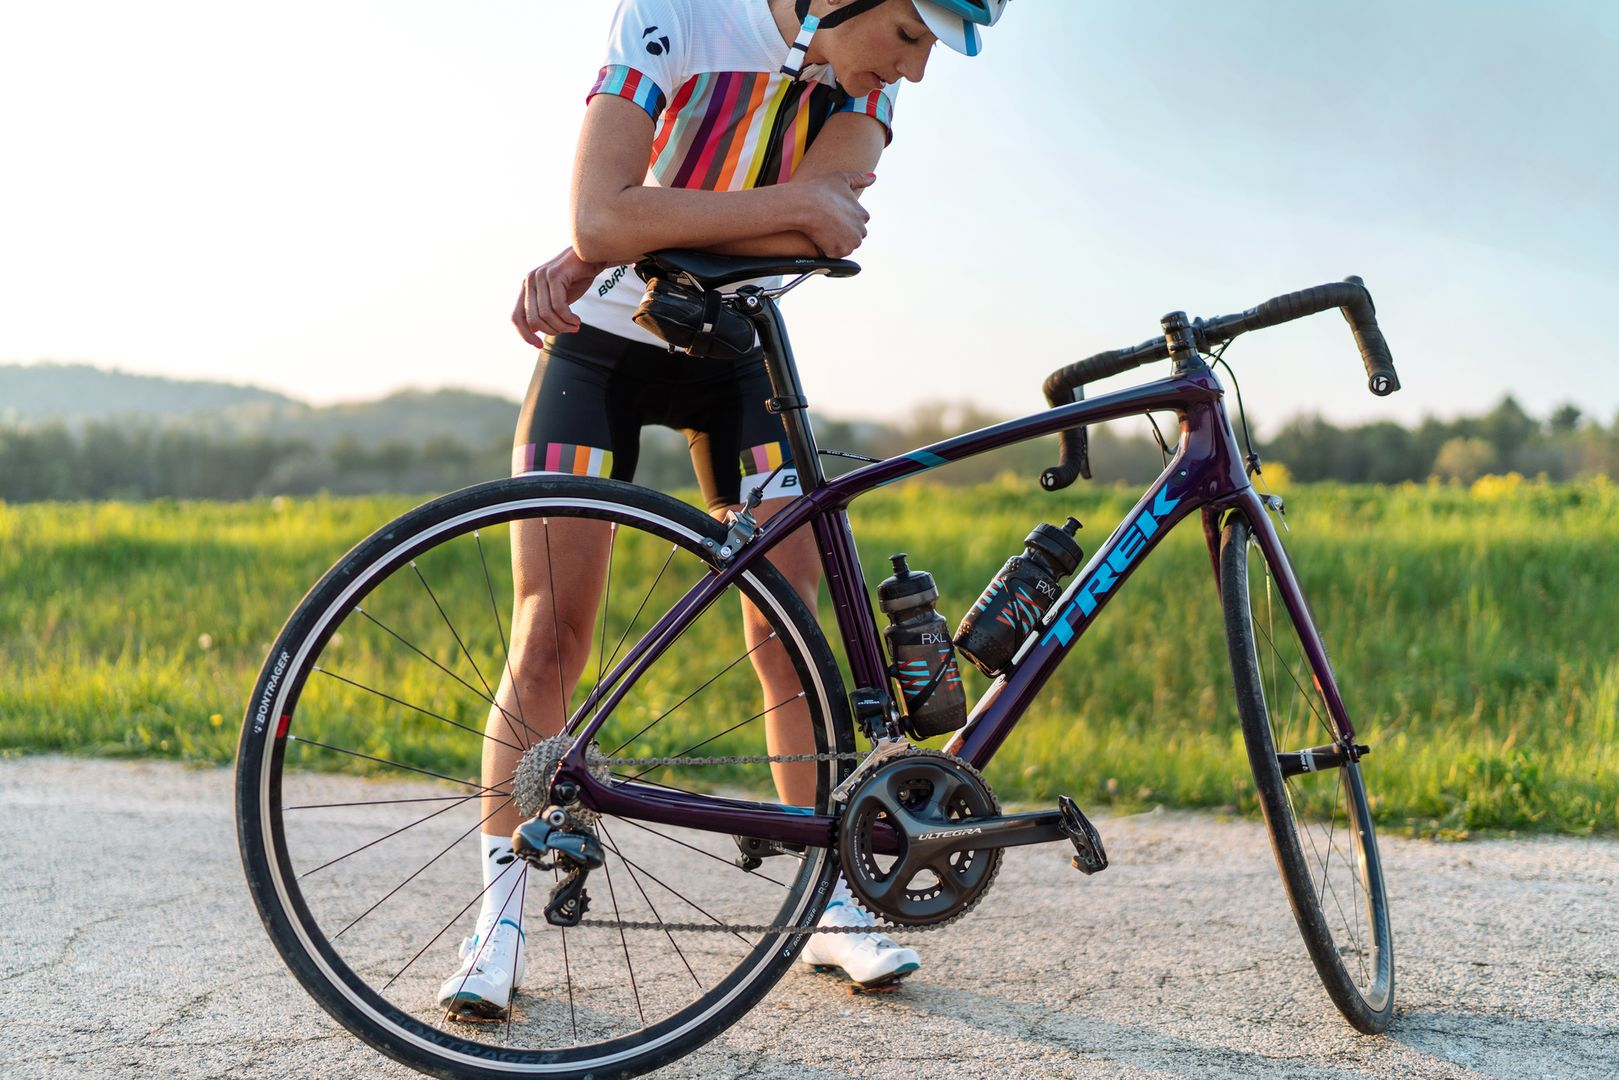 Knoxville Trek Silque S 2017 Bike of Year